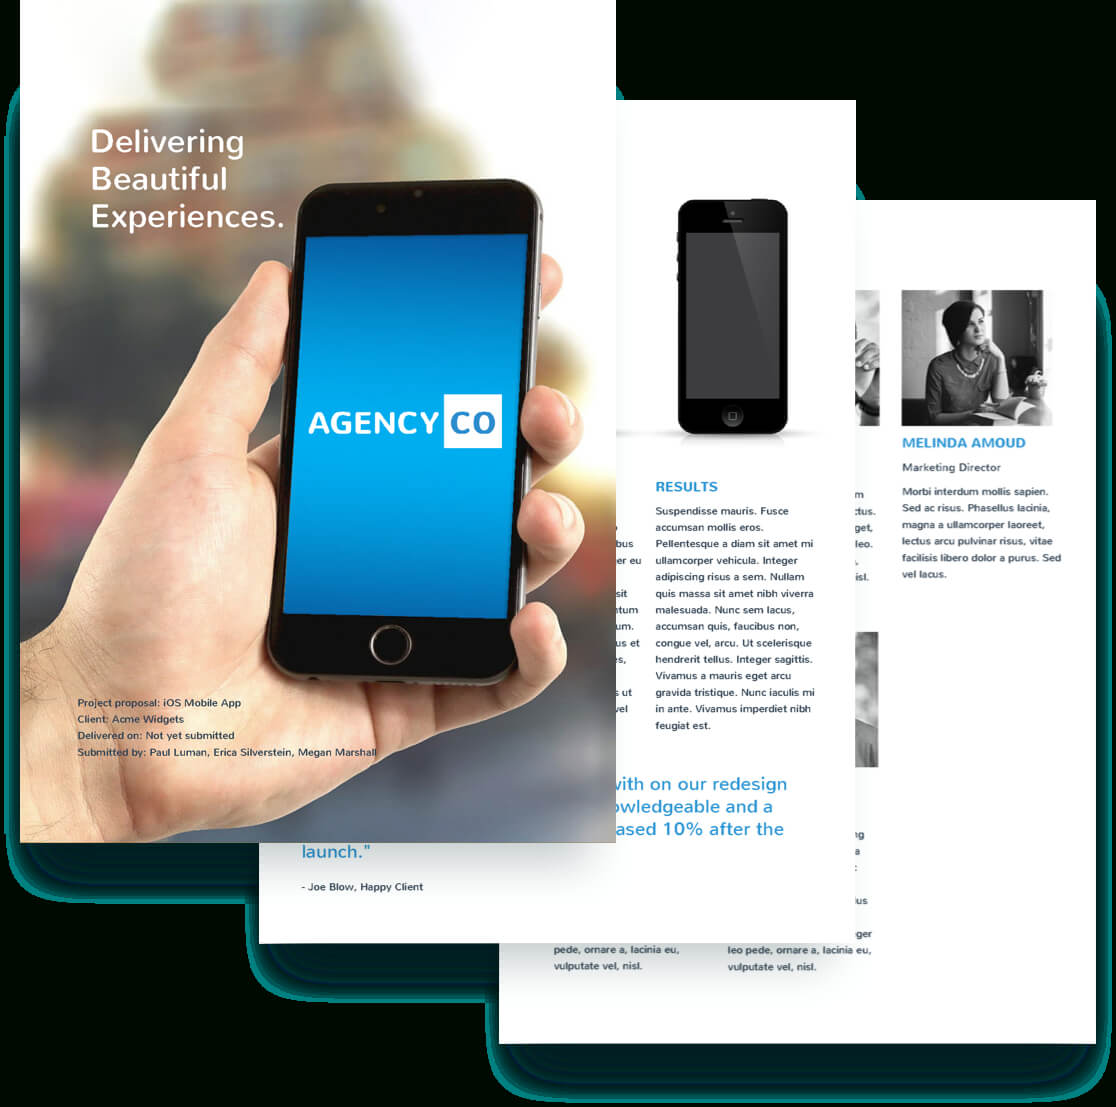 Mobile App Proposal Template – Free Sample | Proposify Regarding App Proposal Template